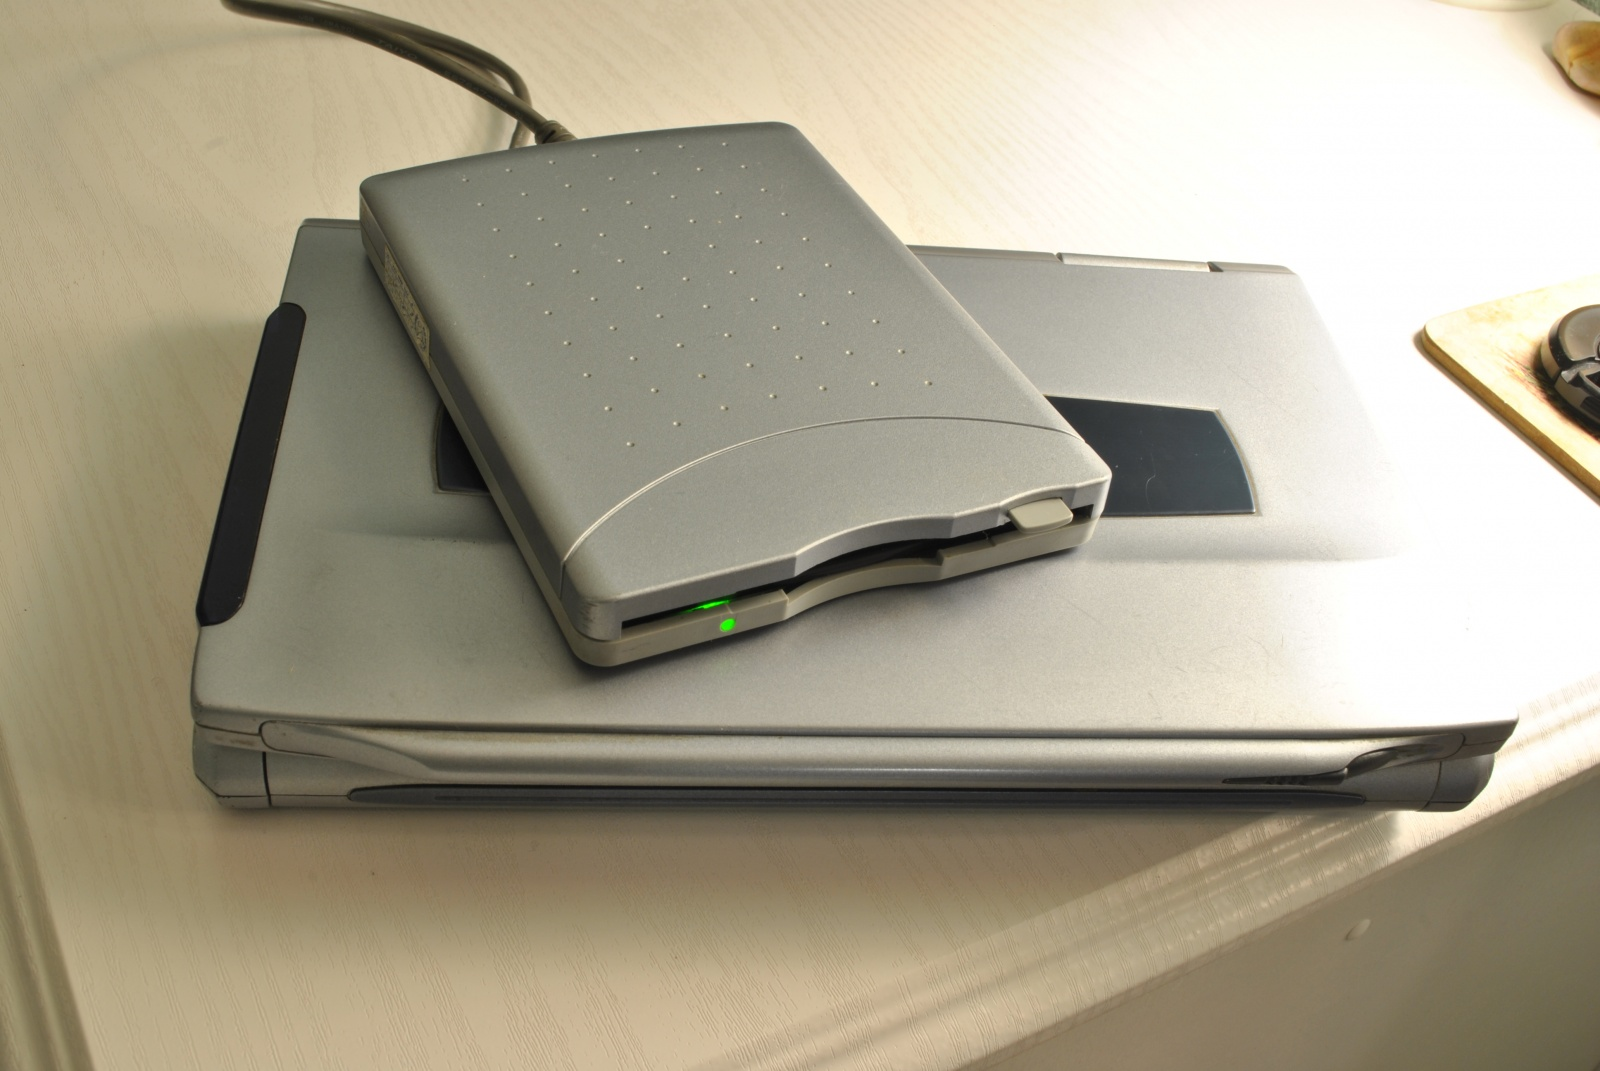 Ультрабук начала 2000-х – обзор Fujitsu LifeBook P-1032 - 2